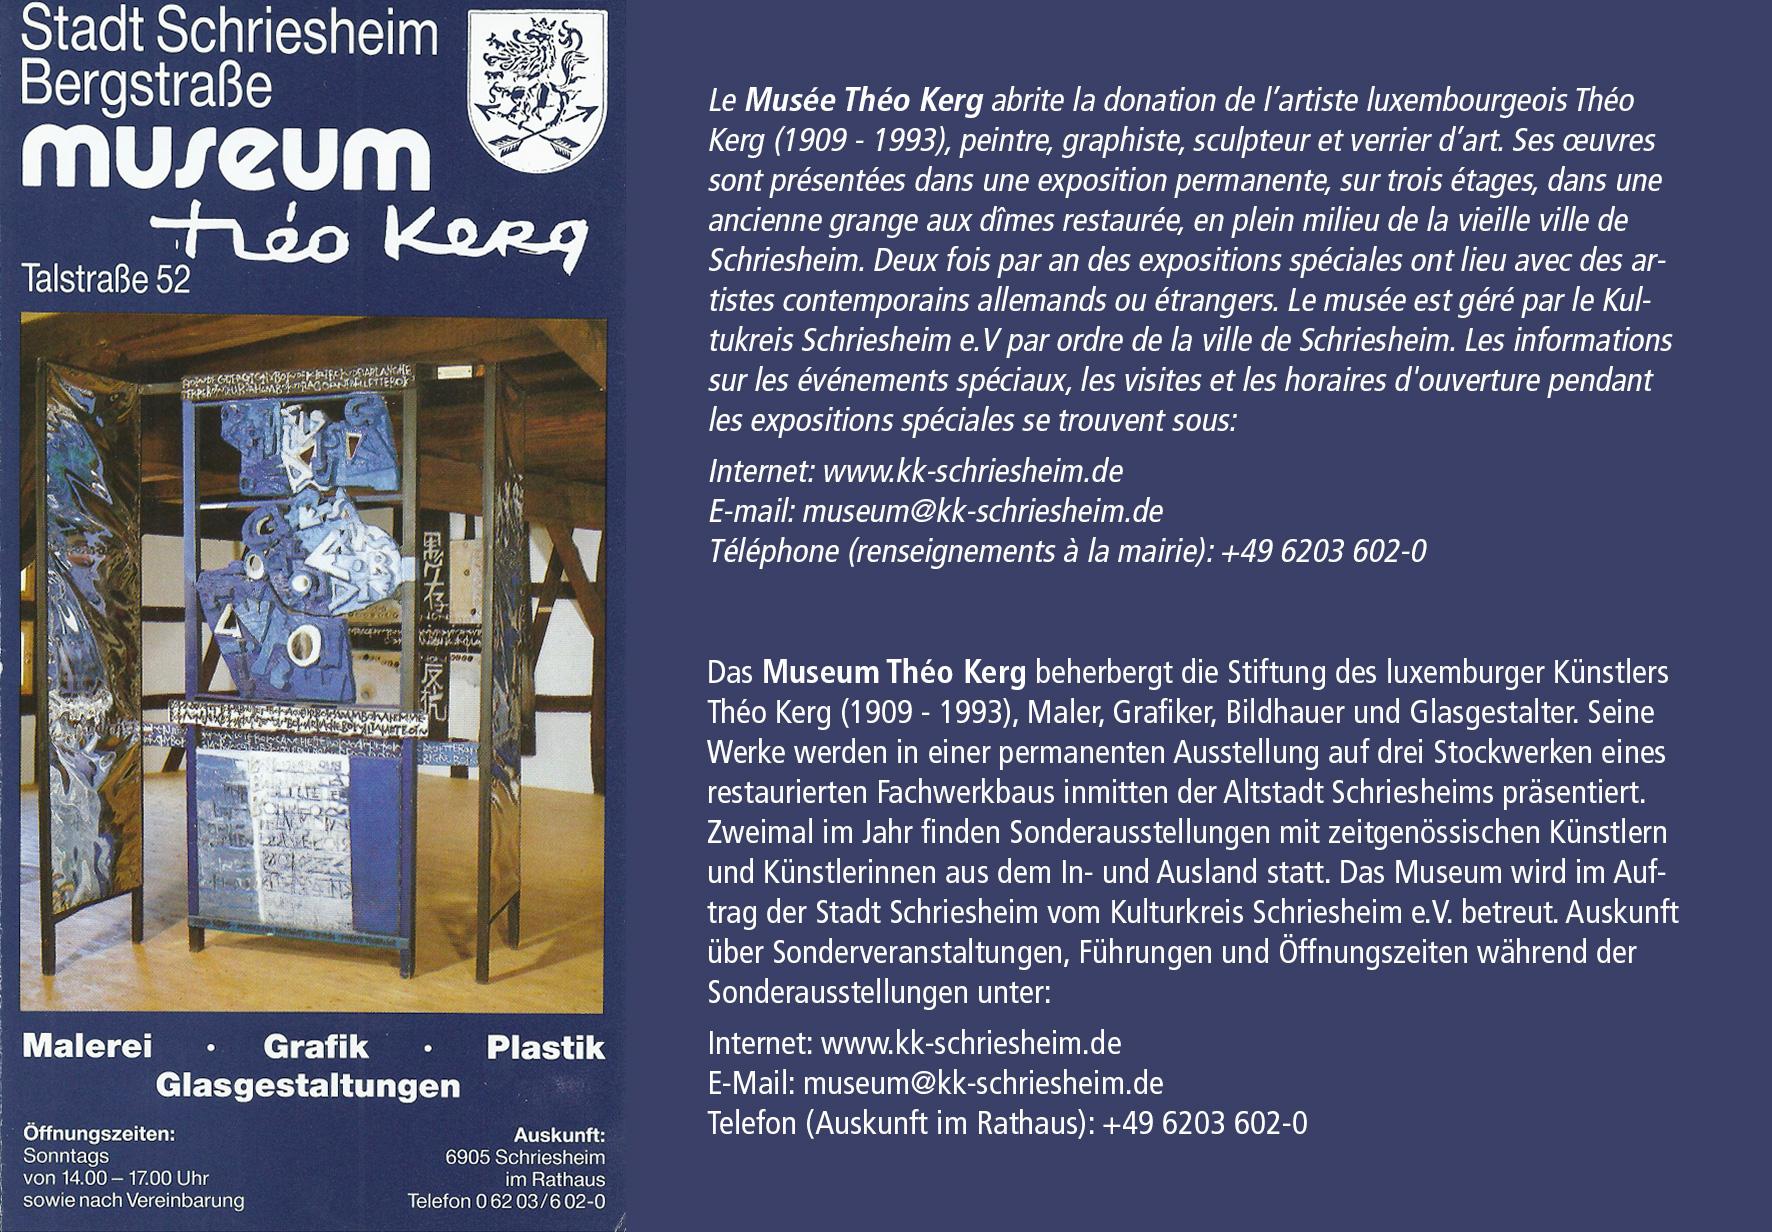 01 – Museum Théo Kerg, Talstraße 52, D-69198 Schriesheim – Exposition permanante